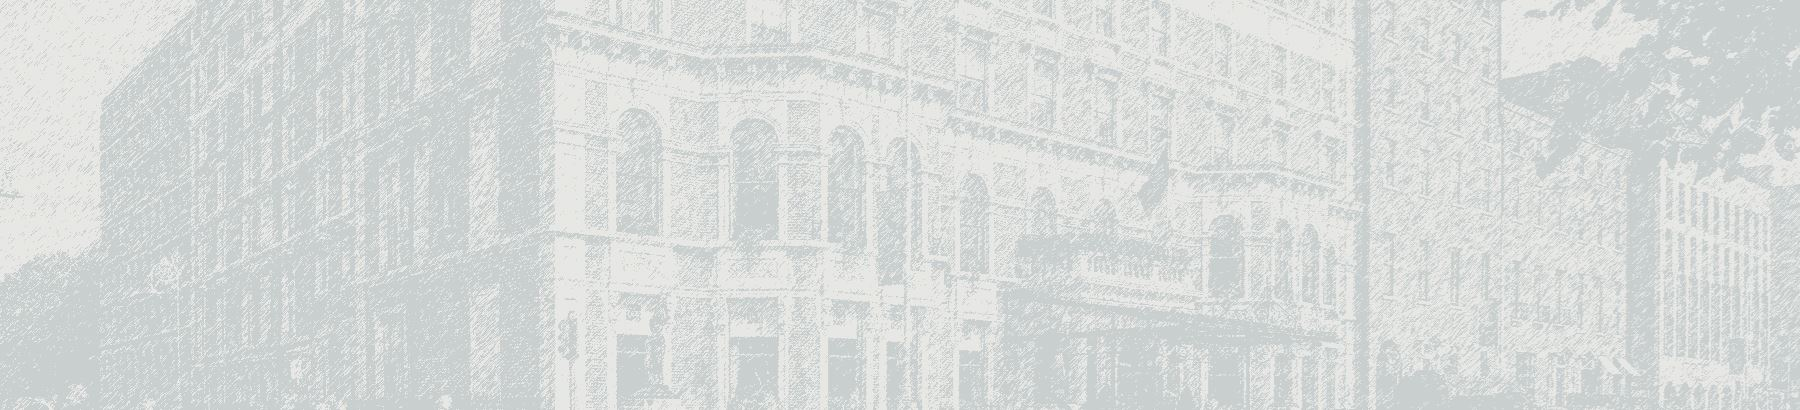 The Shelbourne Hotel, Dublin Genealogy